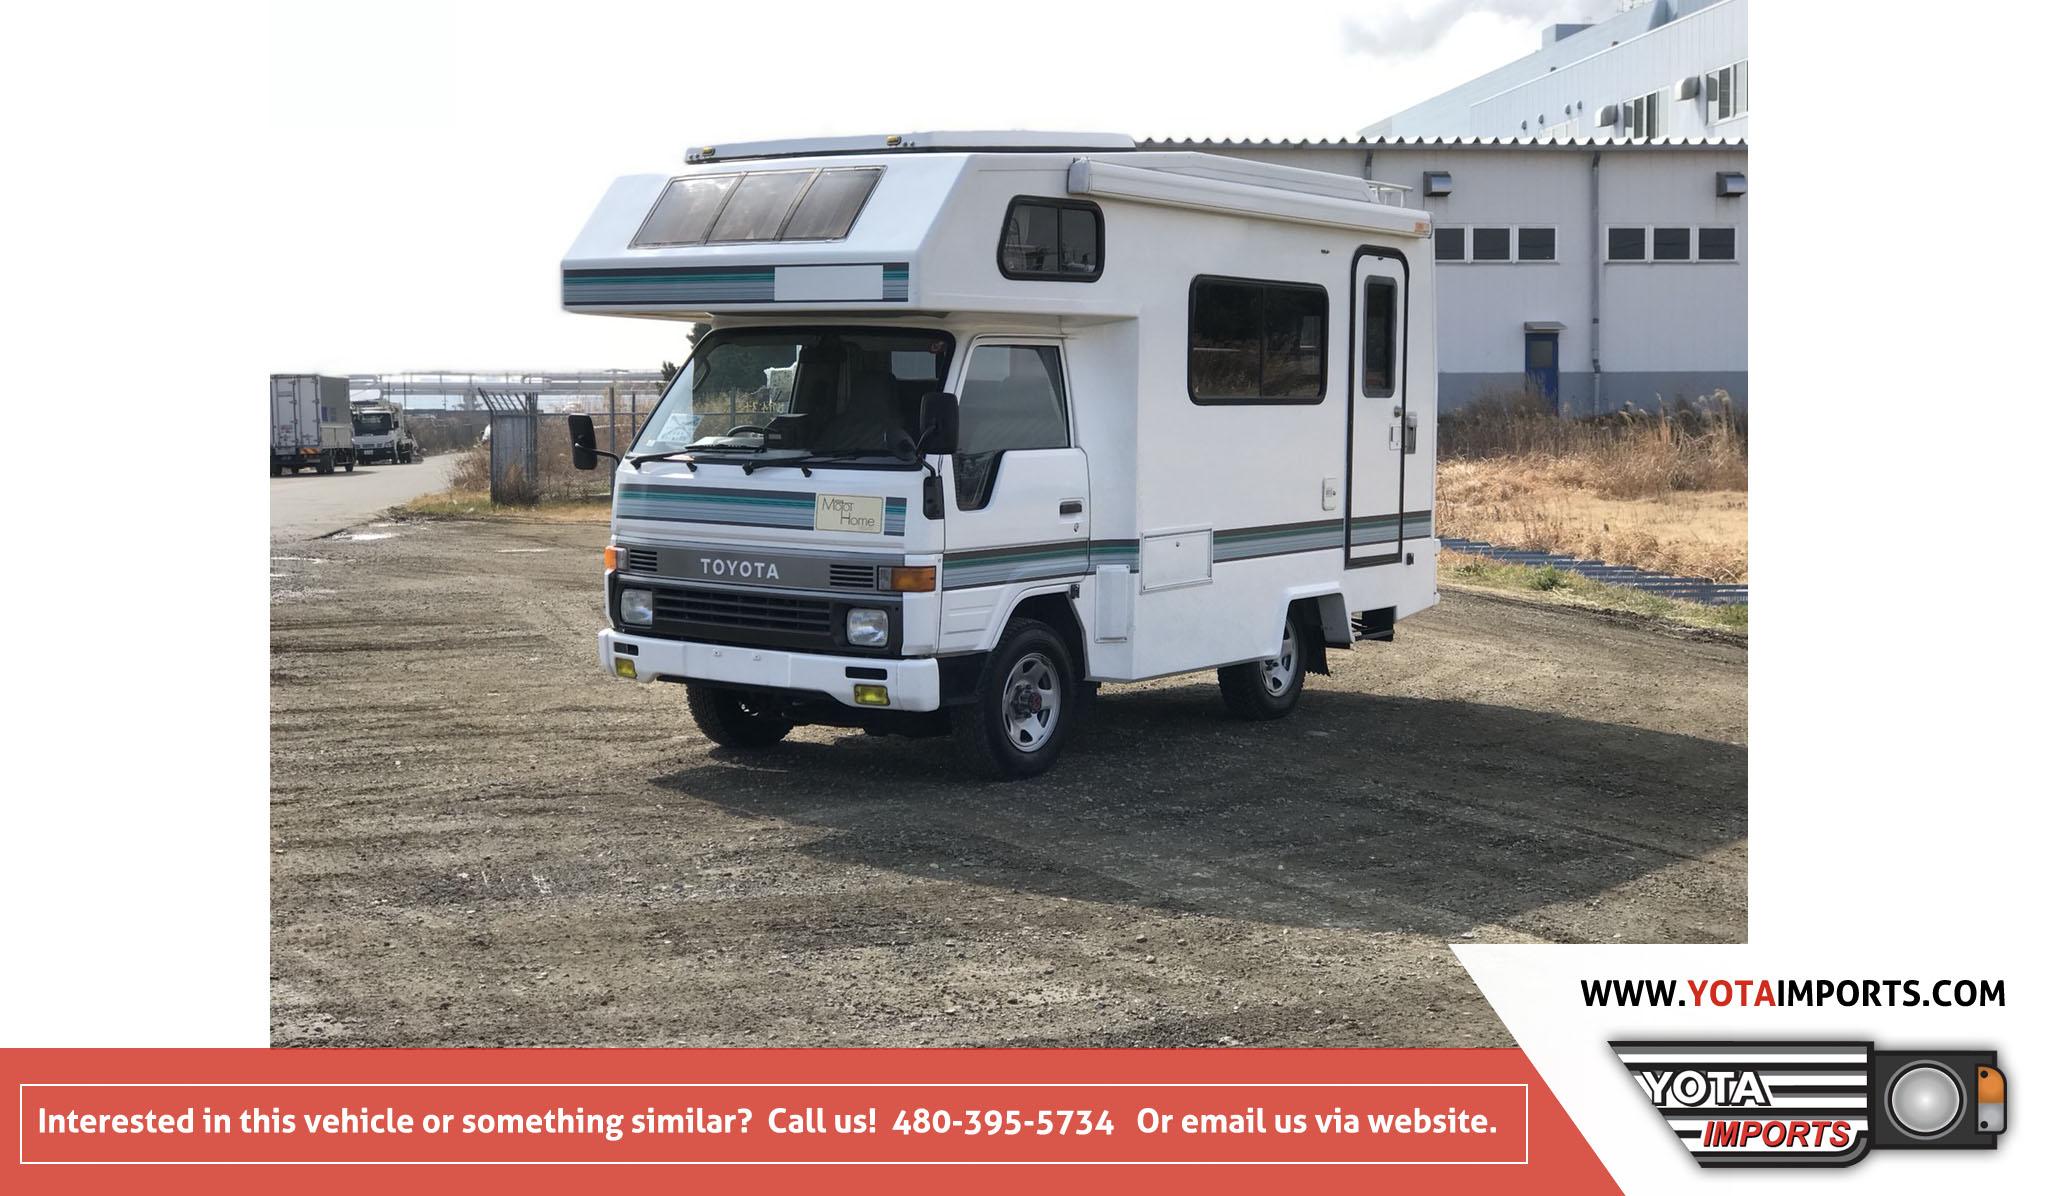 1993 Toyota HiAce Truck Camper – Yota Imports